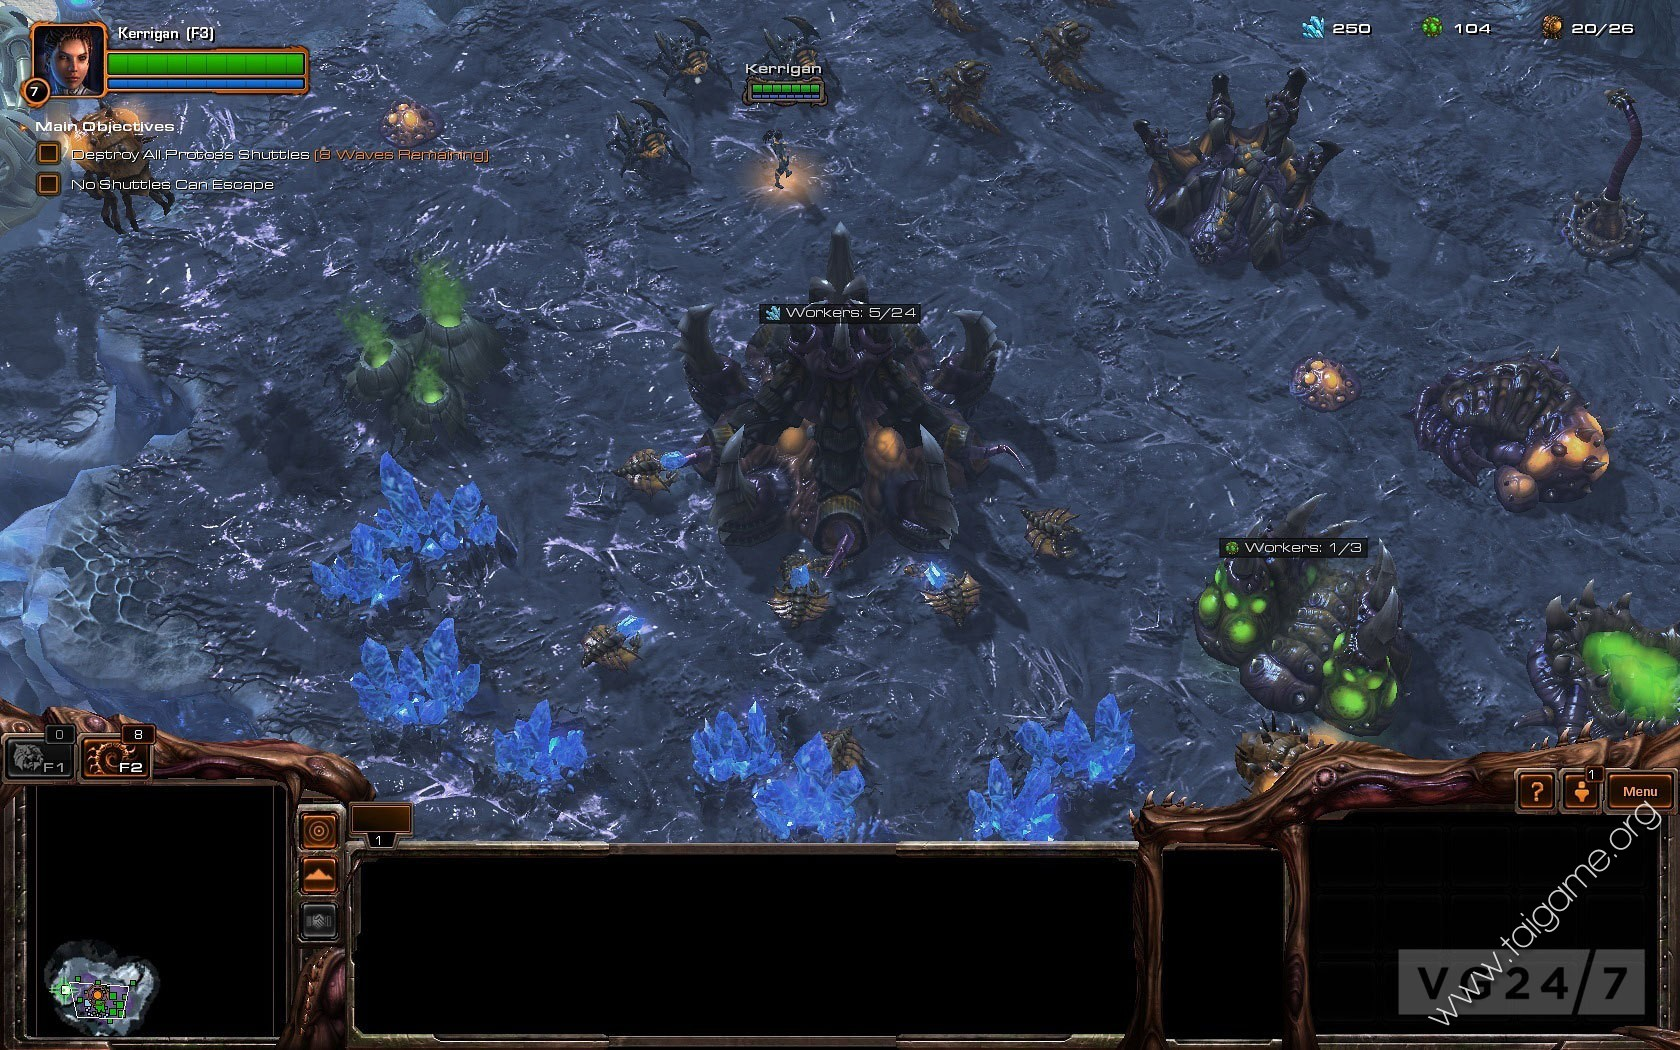 Zerg units heart of the swarm